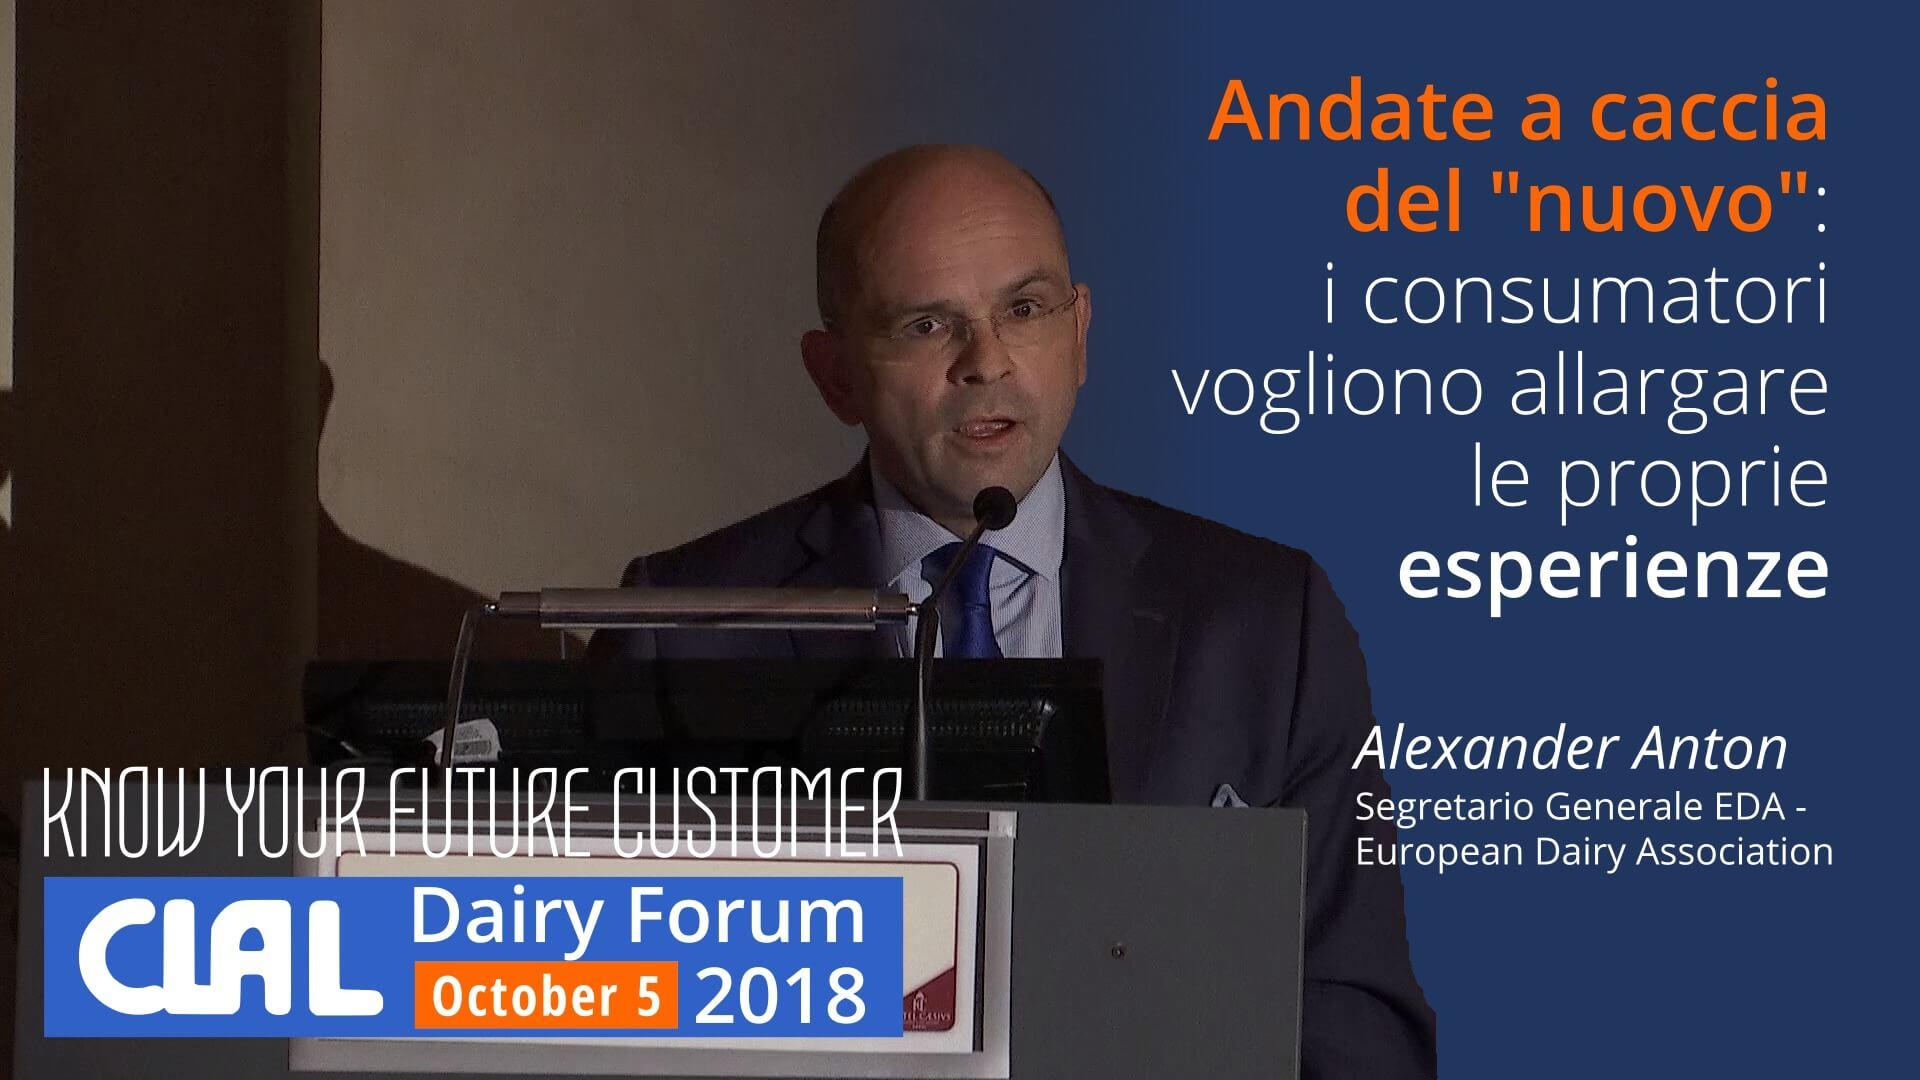 Alexander Anton, Segretario Generale EDA - European Dairy Association